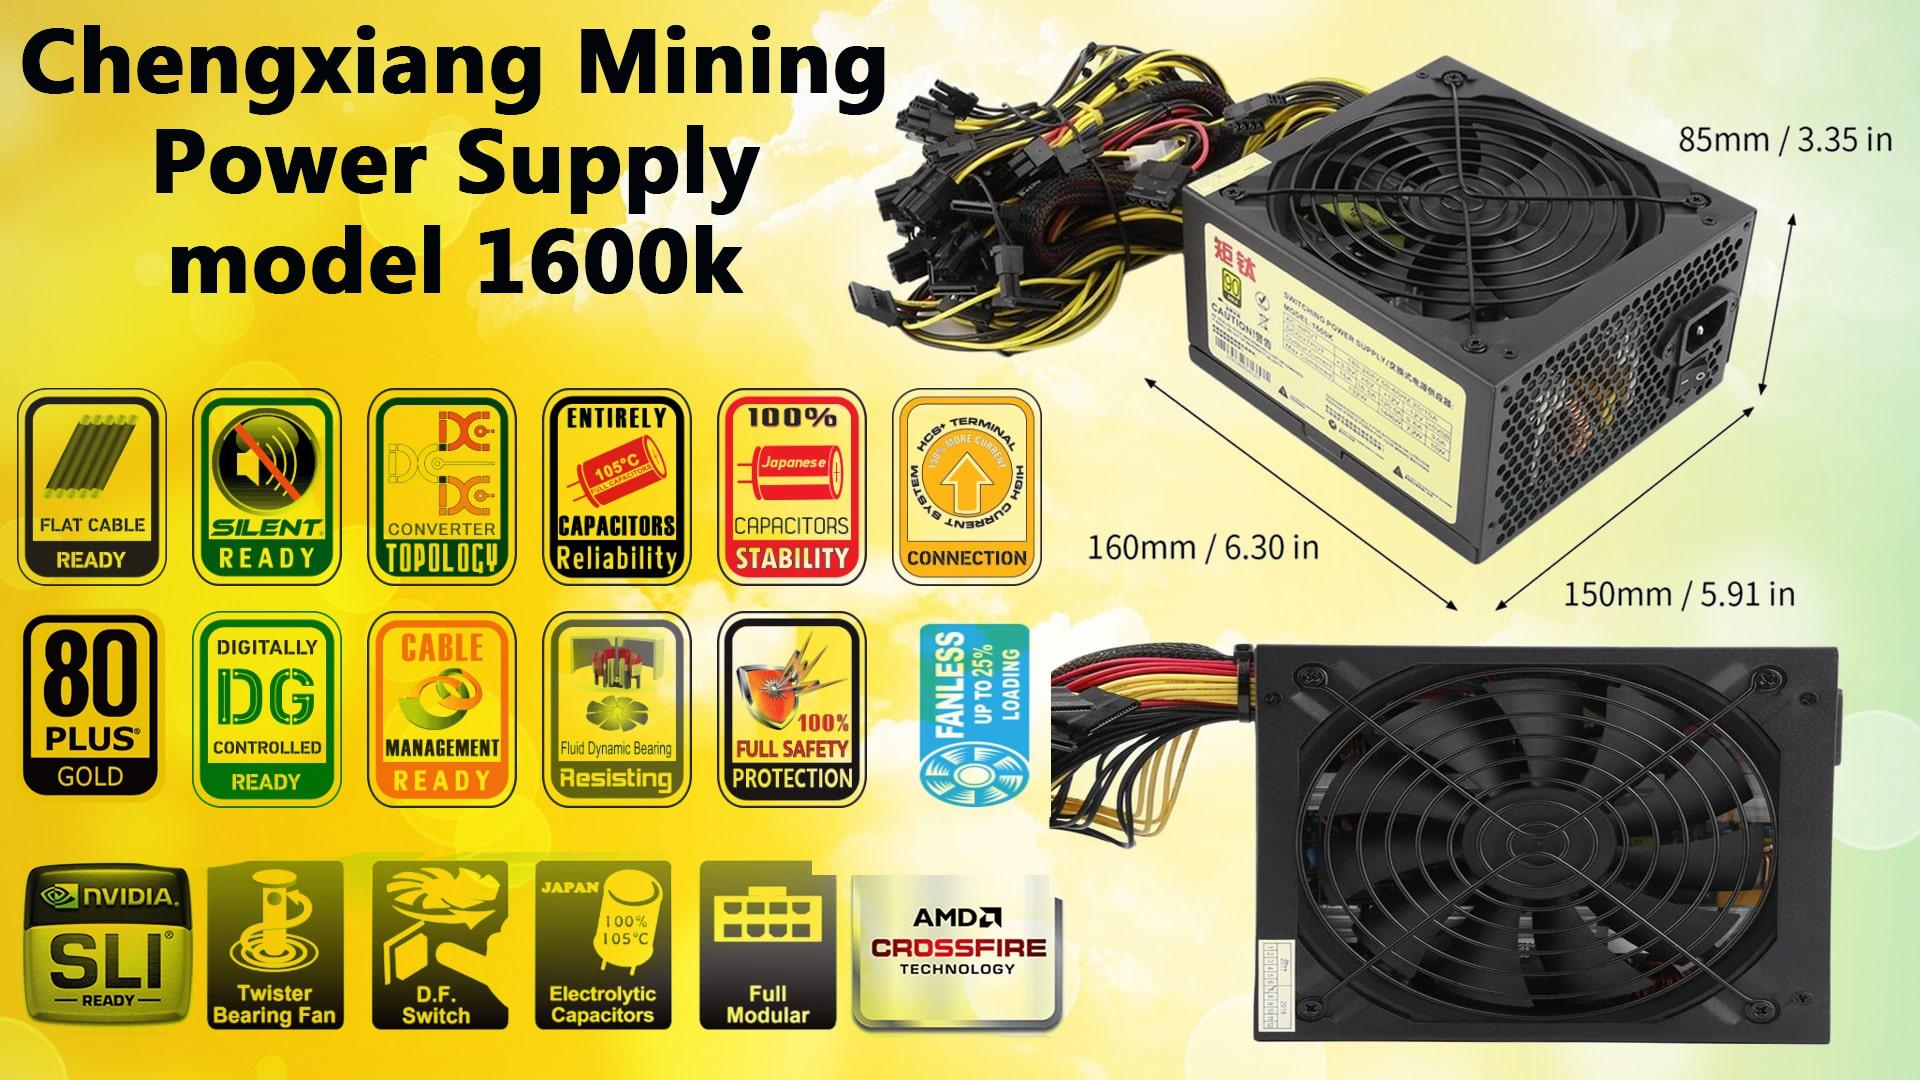 پاور کامپیوتر 1600 وات مدل Chengxiang Mining Power Supply model 1600k